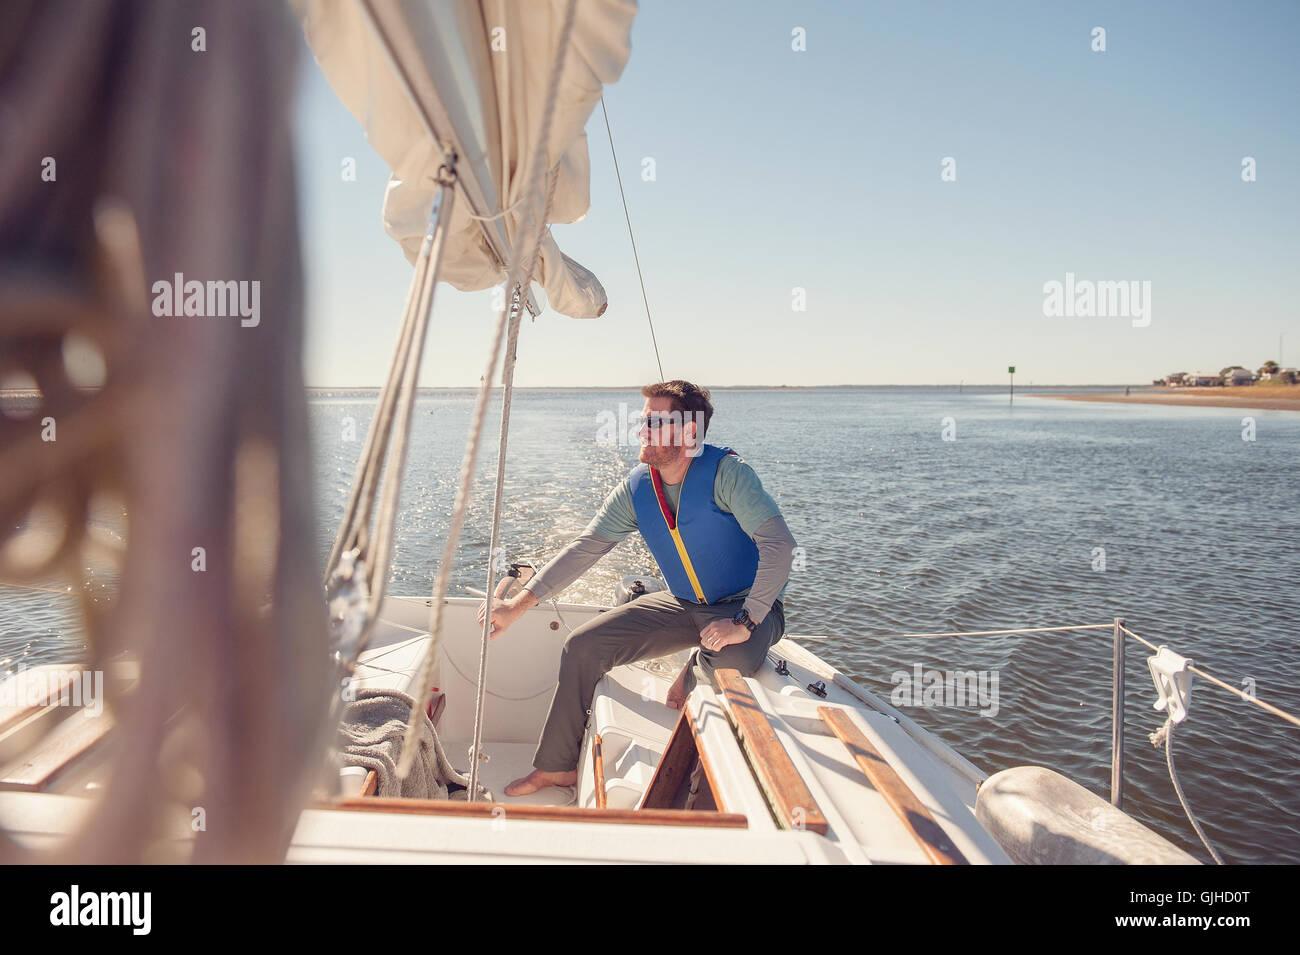 Man sailing sailboat, Florida, America, USA - Stock Image